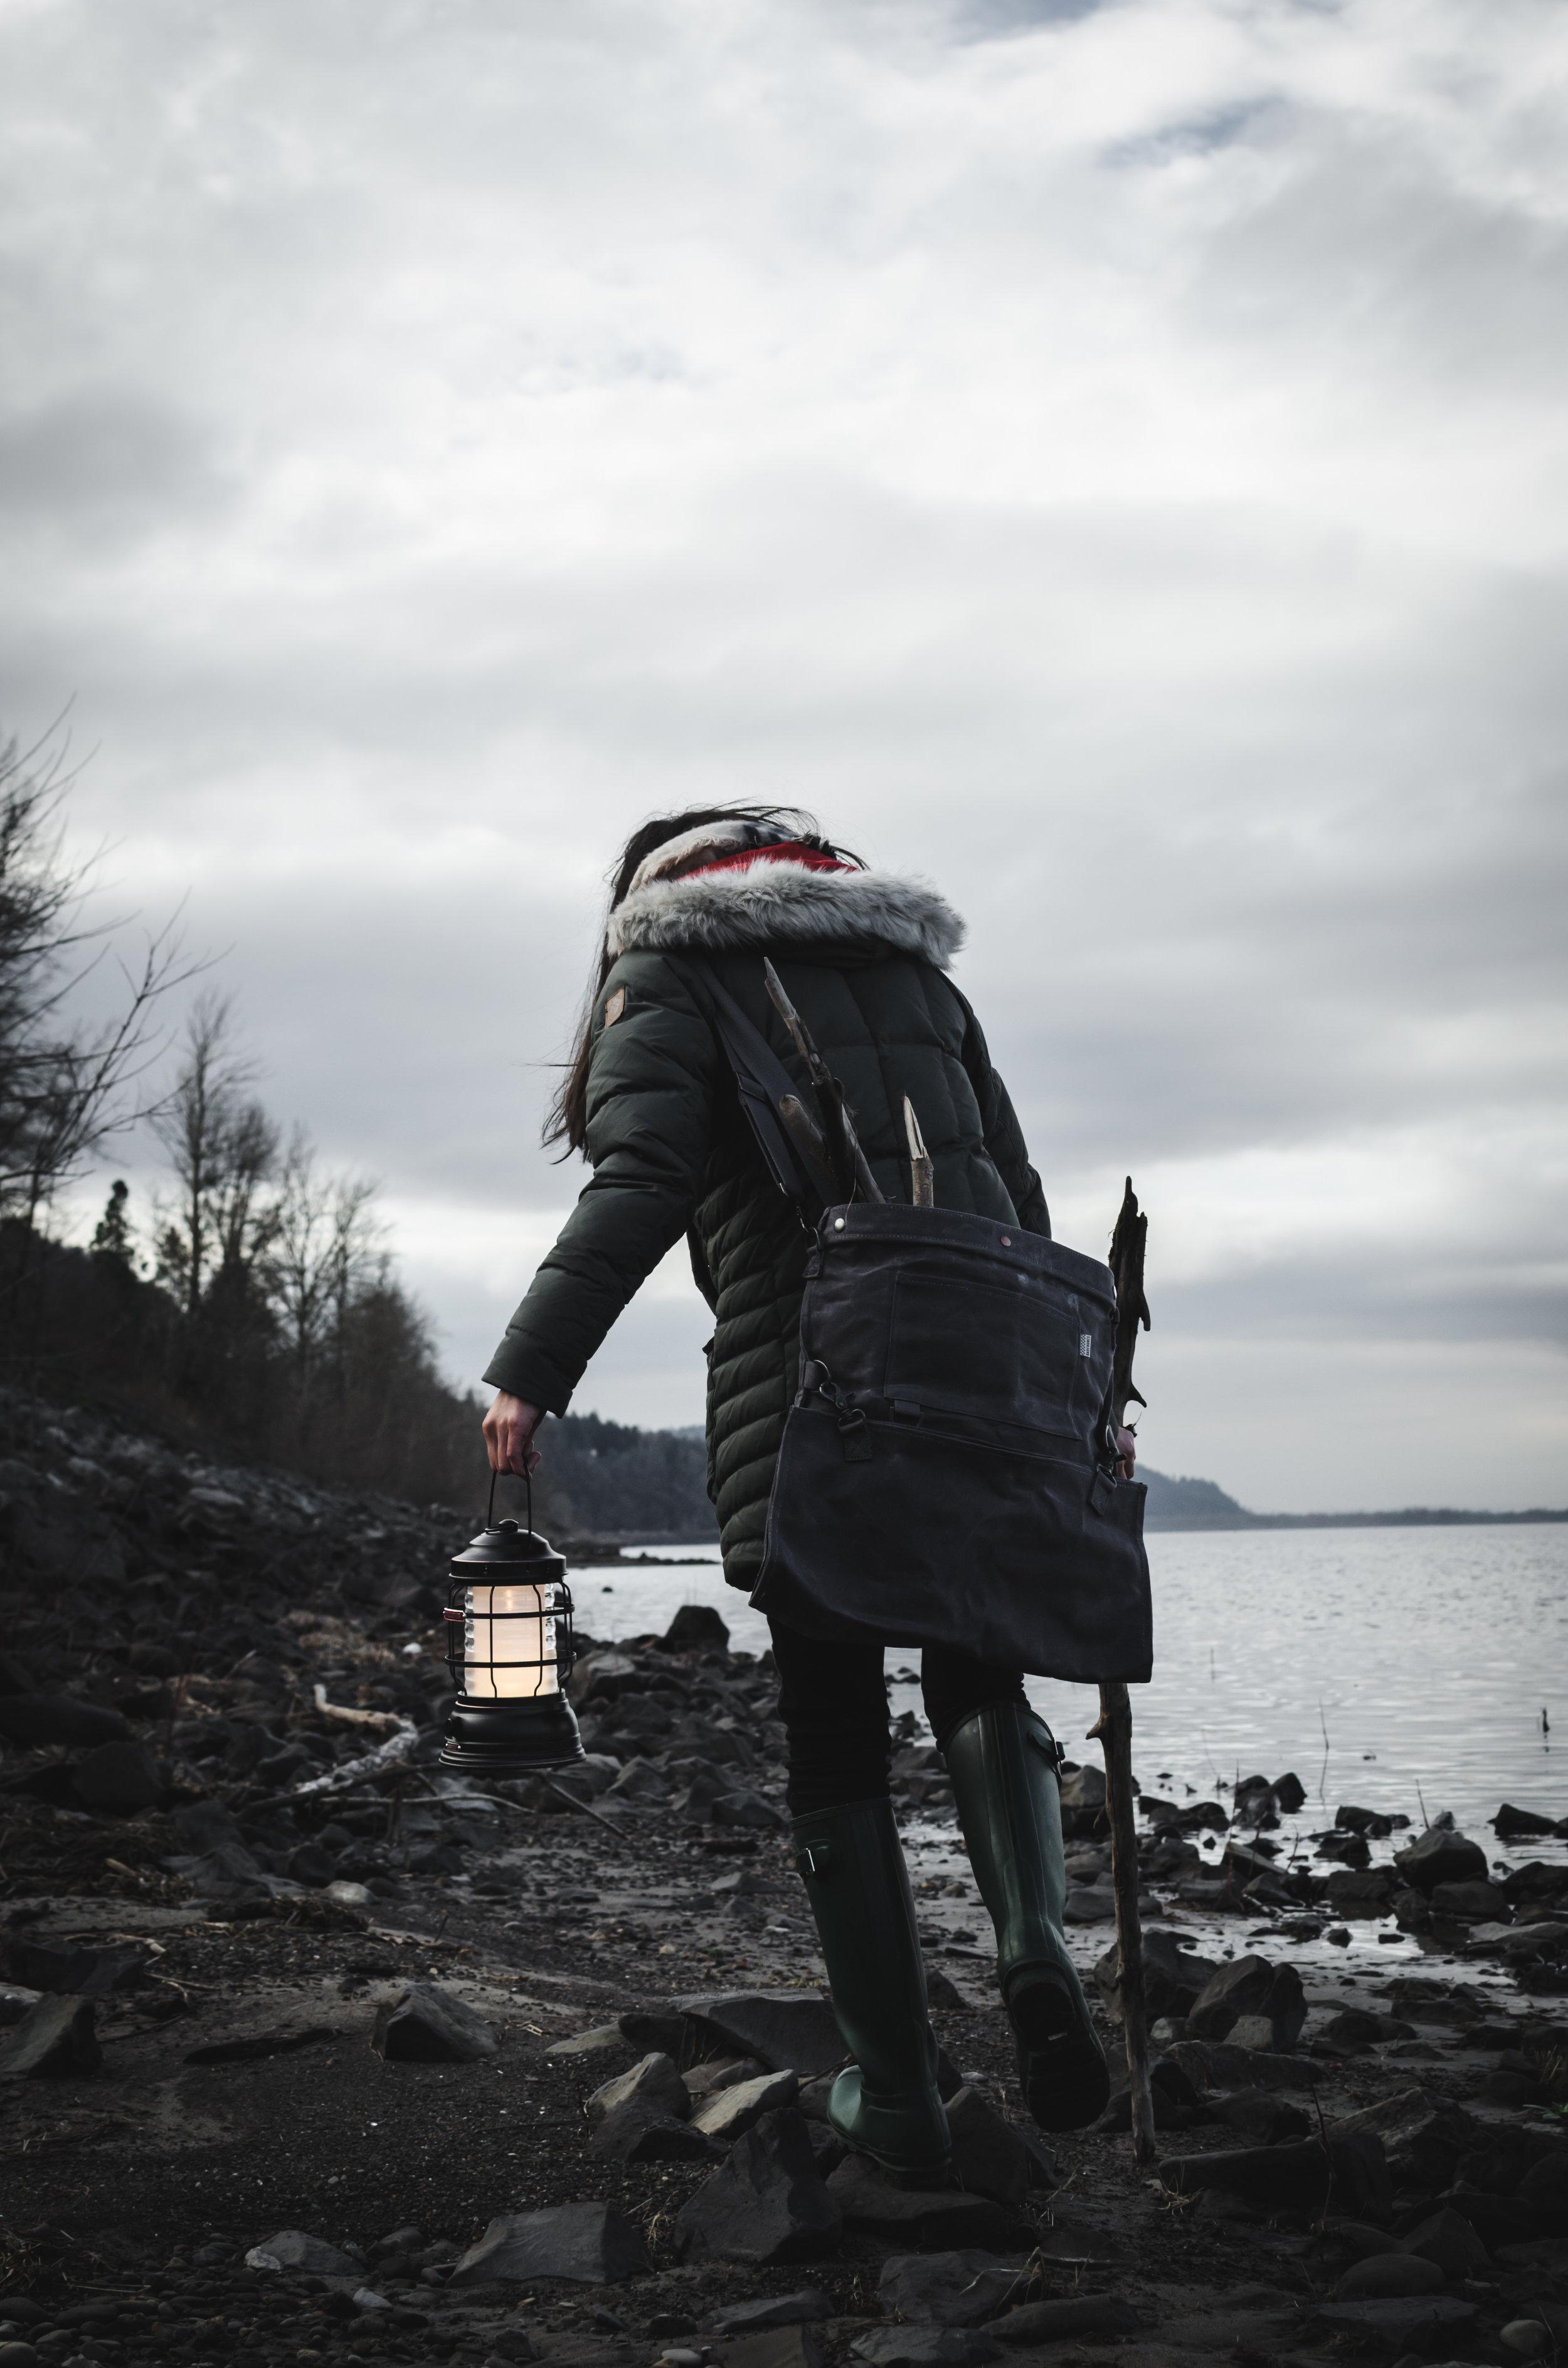 Open Fire Winter Picnic in Columbia River Gorge